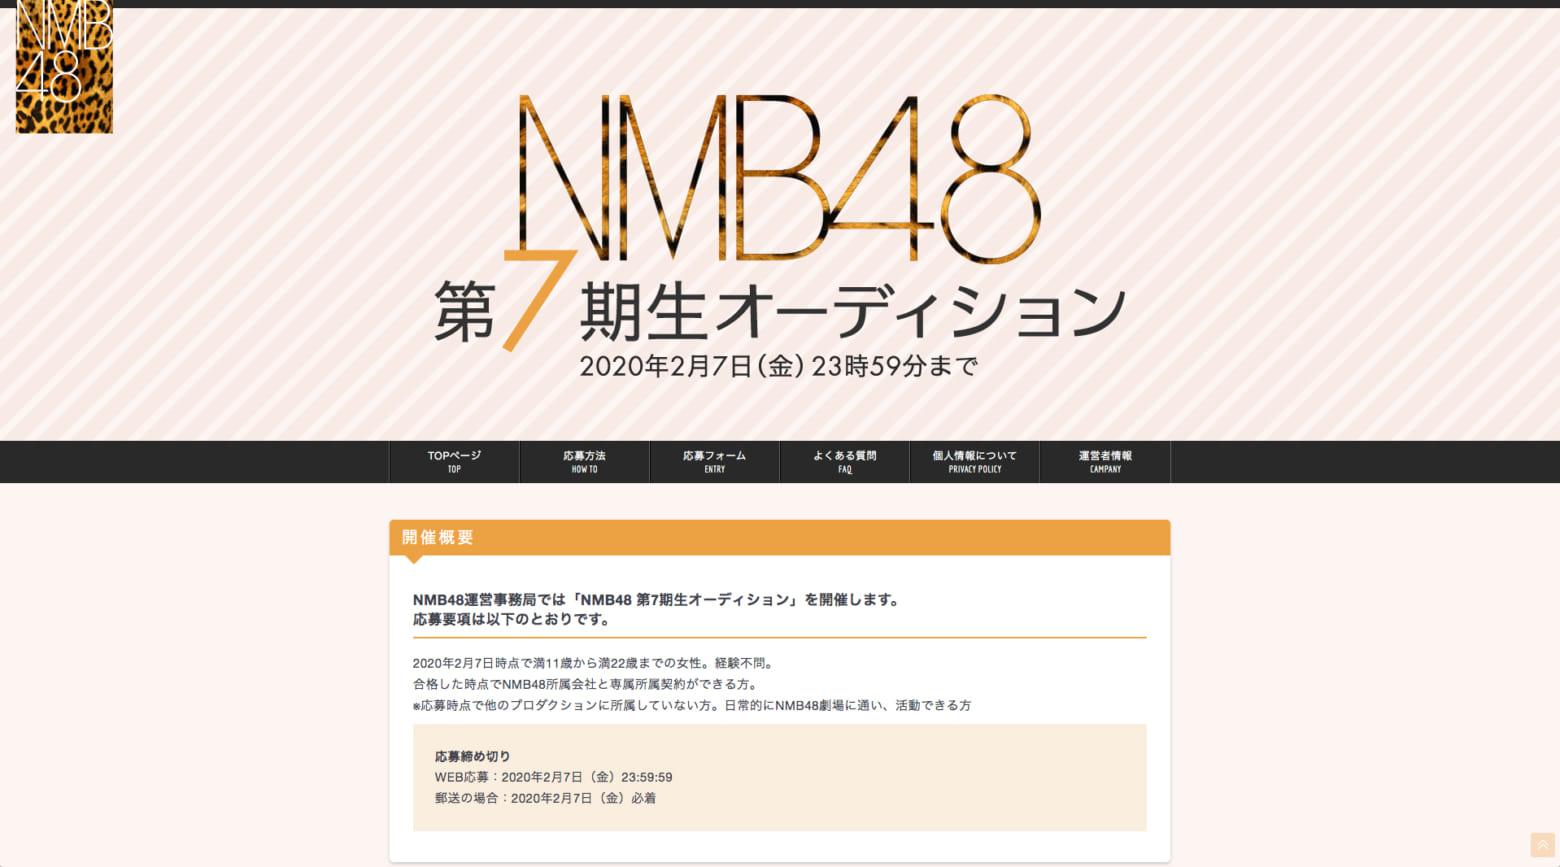 「NMB48 第7期生オーディション」トップページ